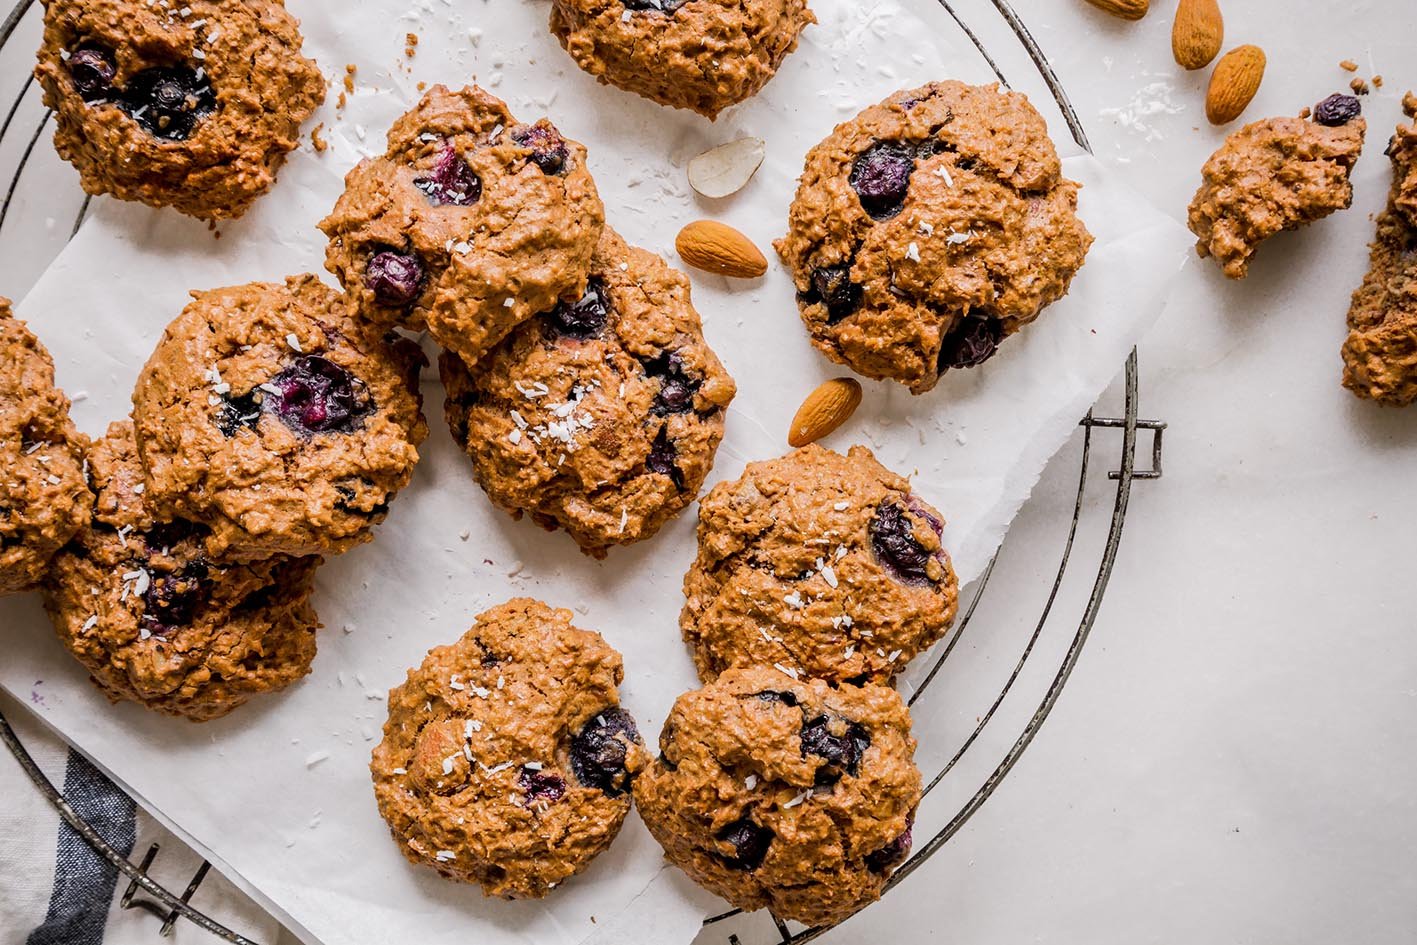 Gesunde Blaubeer-Kokos-Cookies auf Kuchengitter